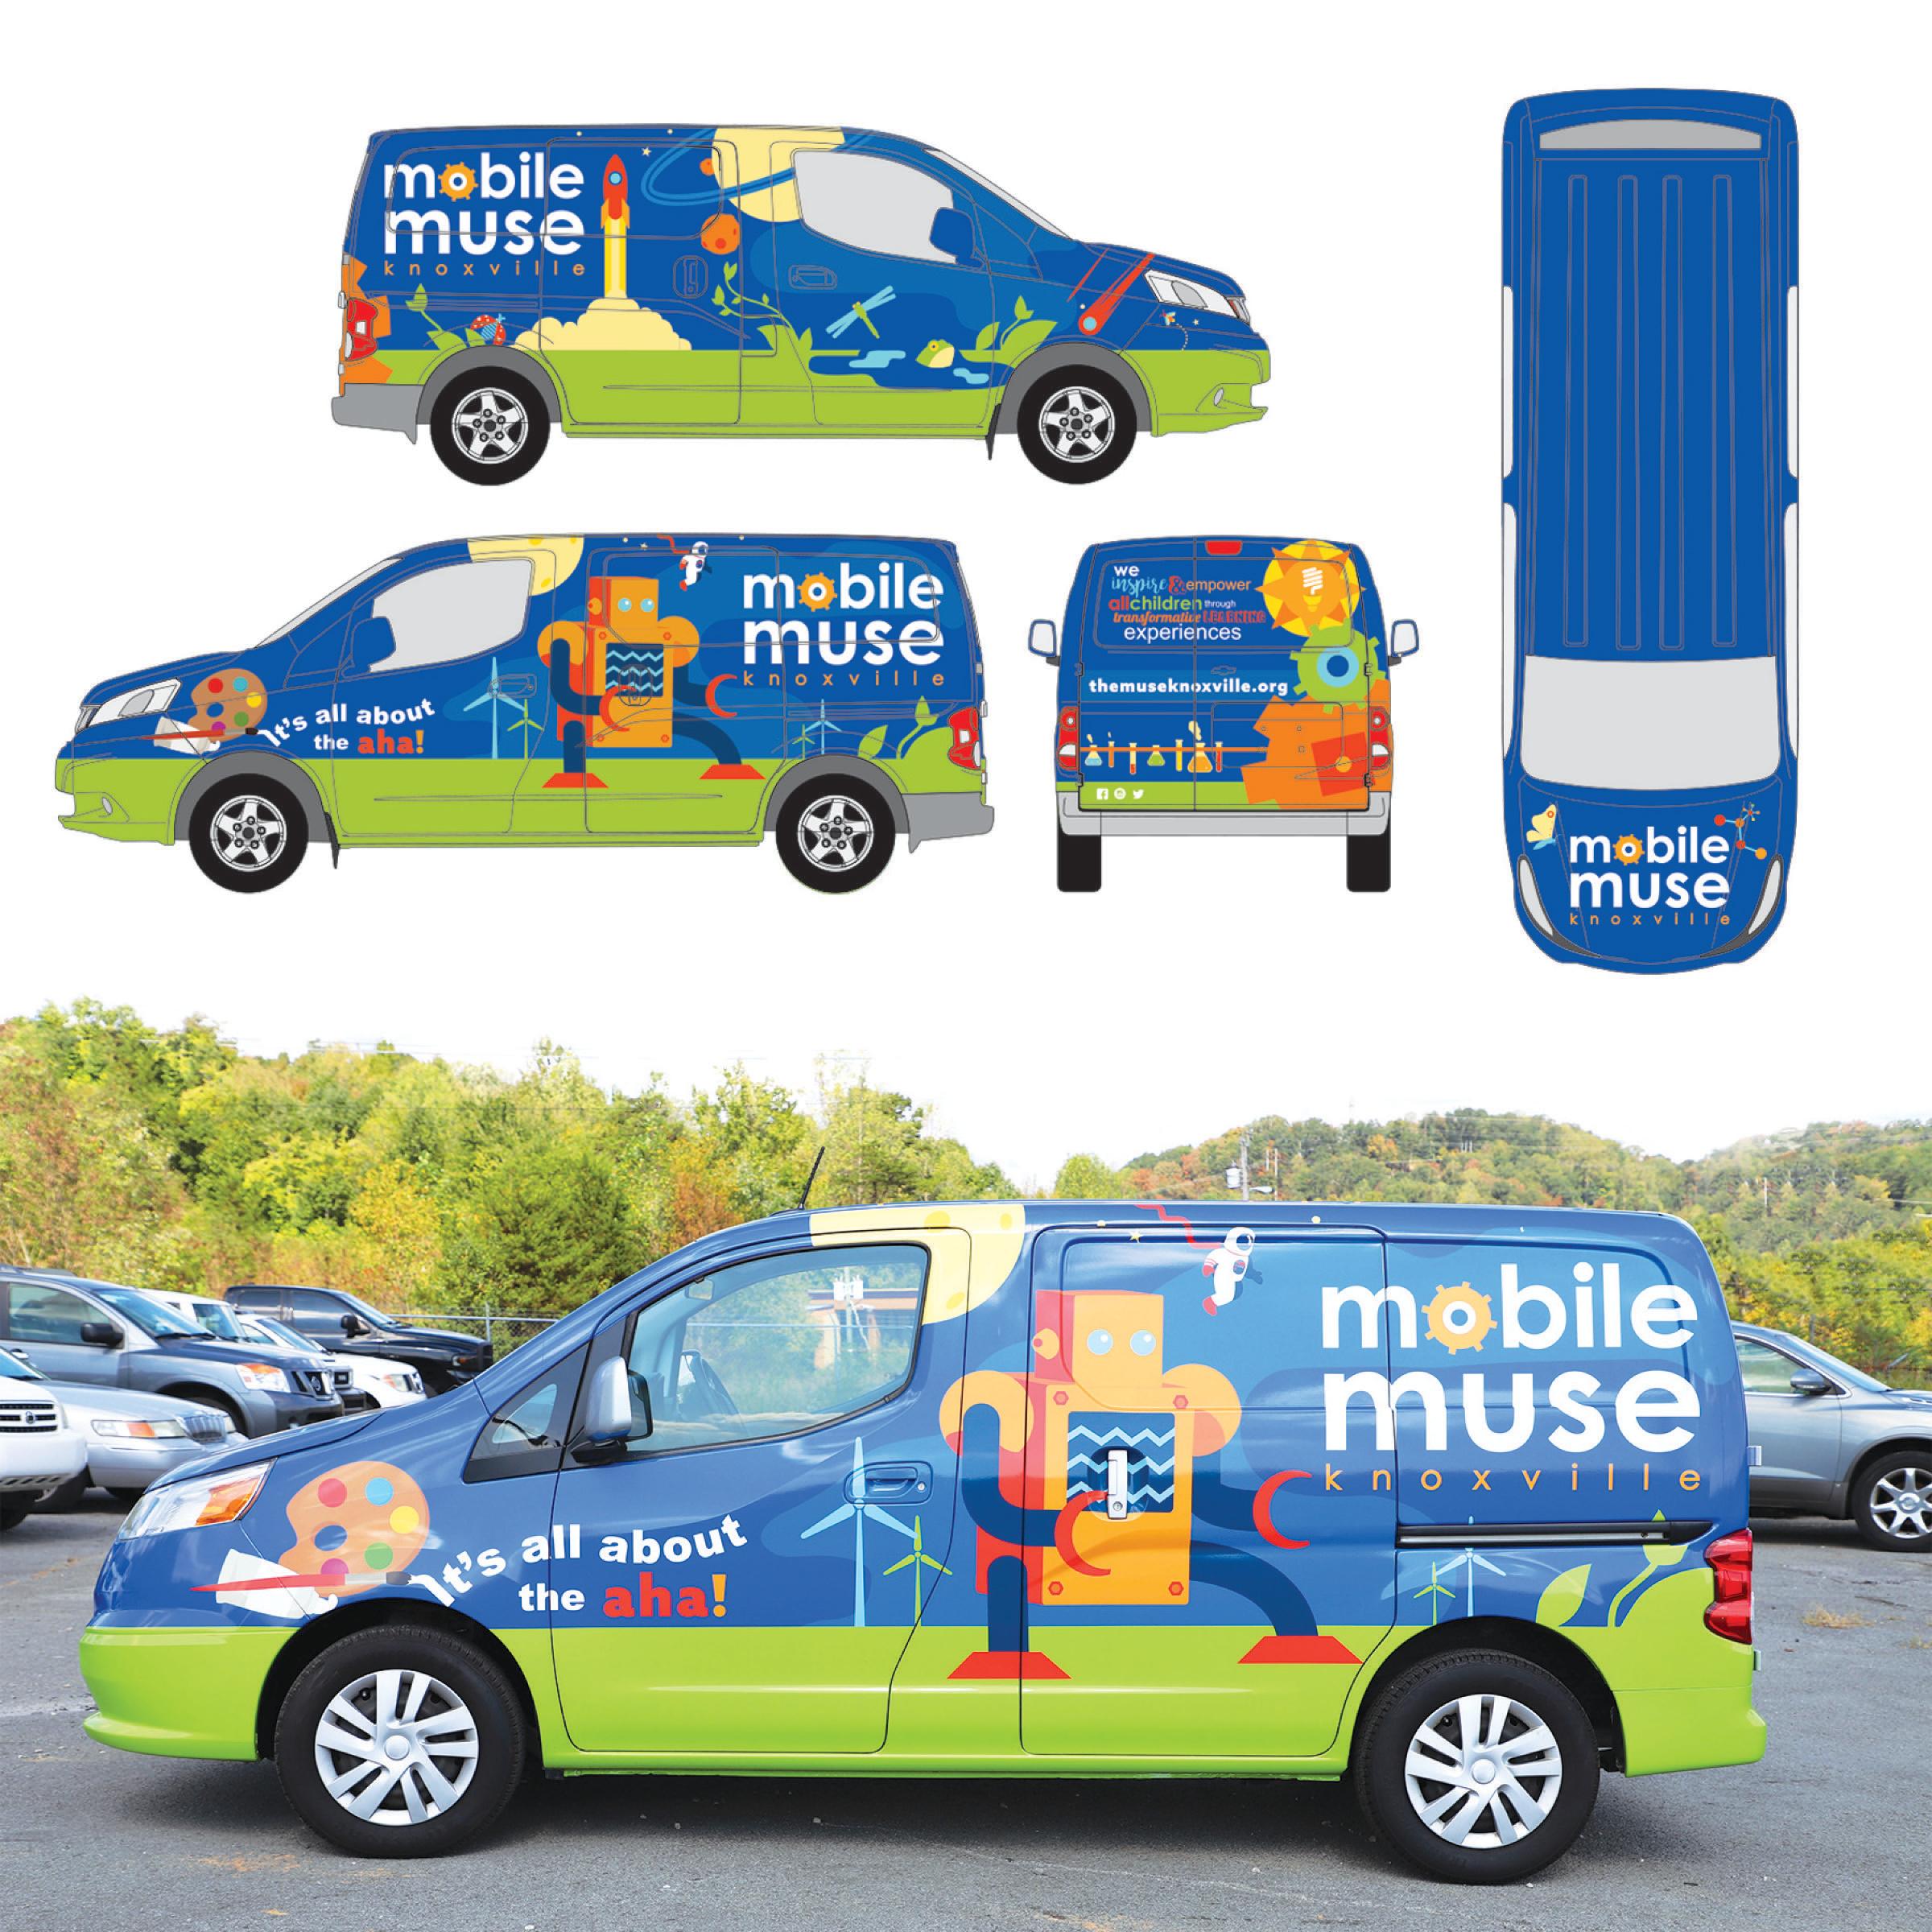 Mobile Muse_GDUSA_sub1